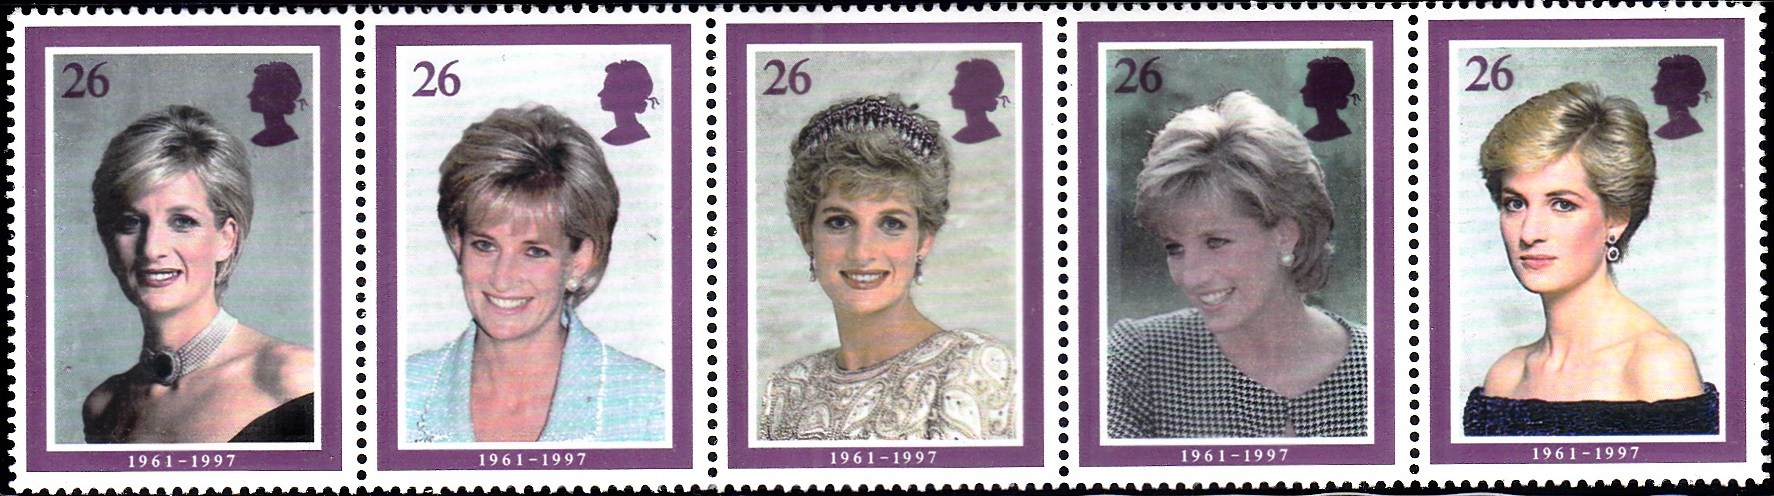 1791-1795 Portraits of Diana [England Setenant Stamp 1998]